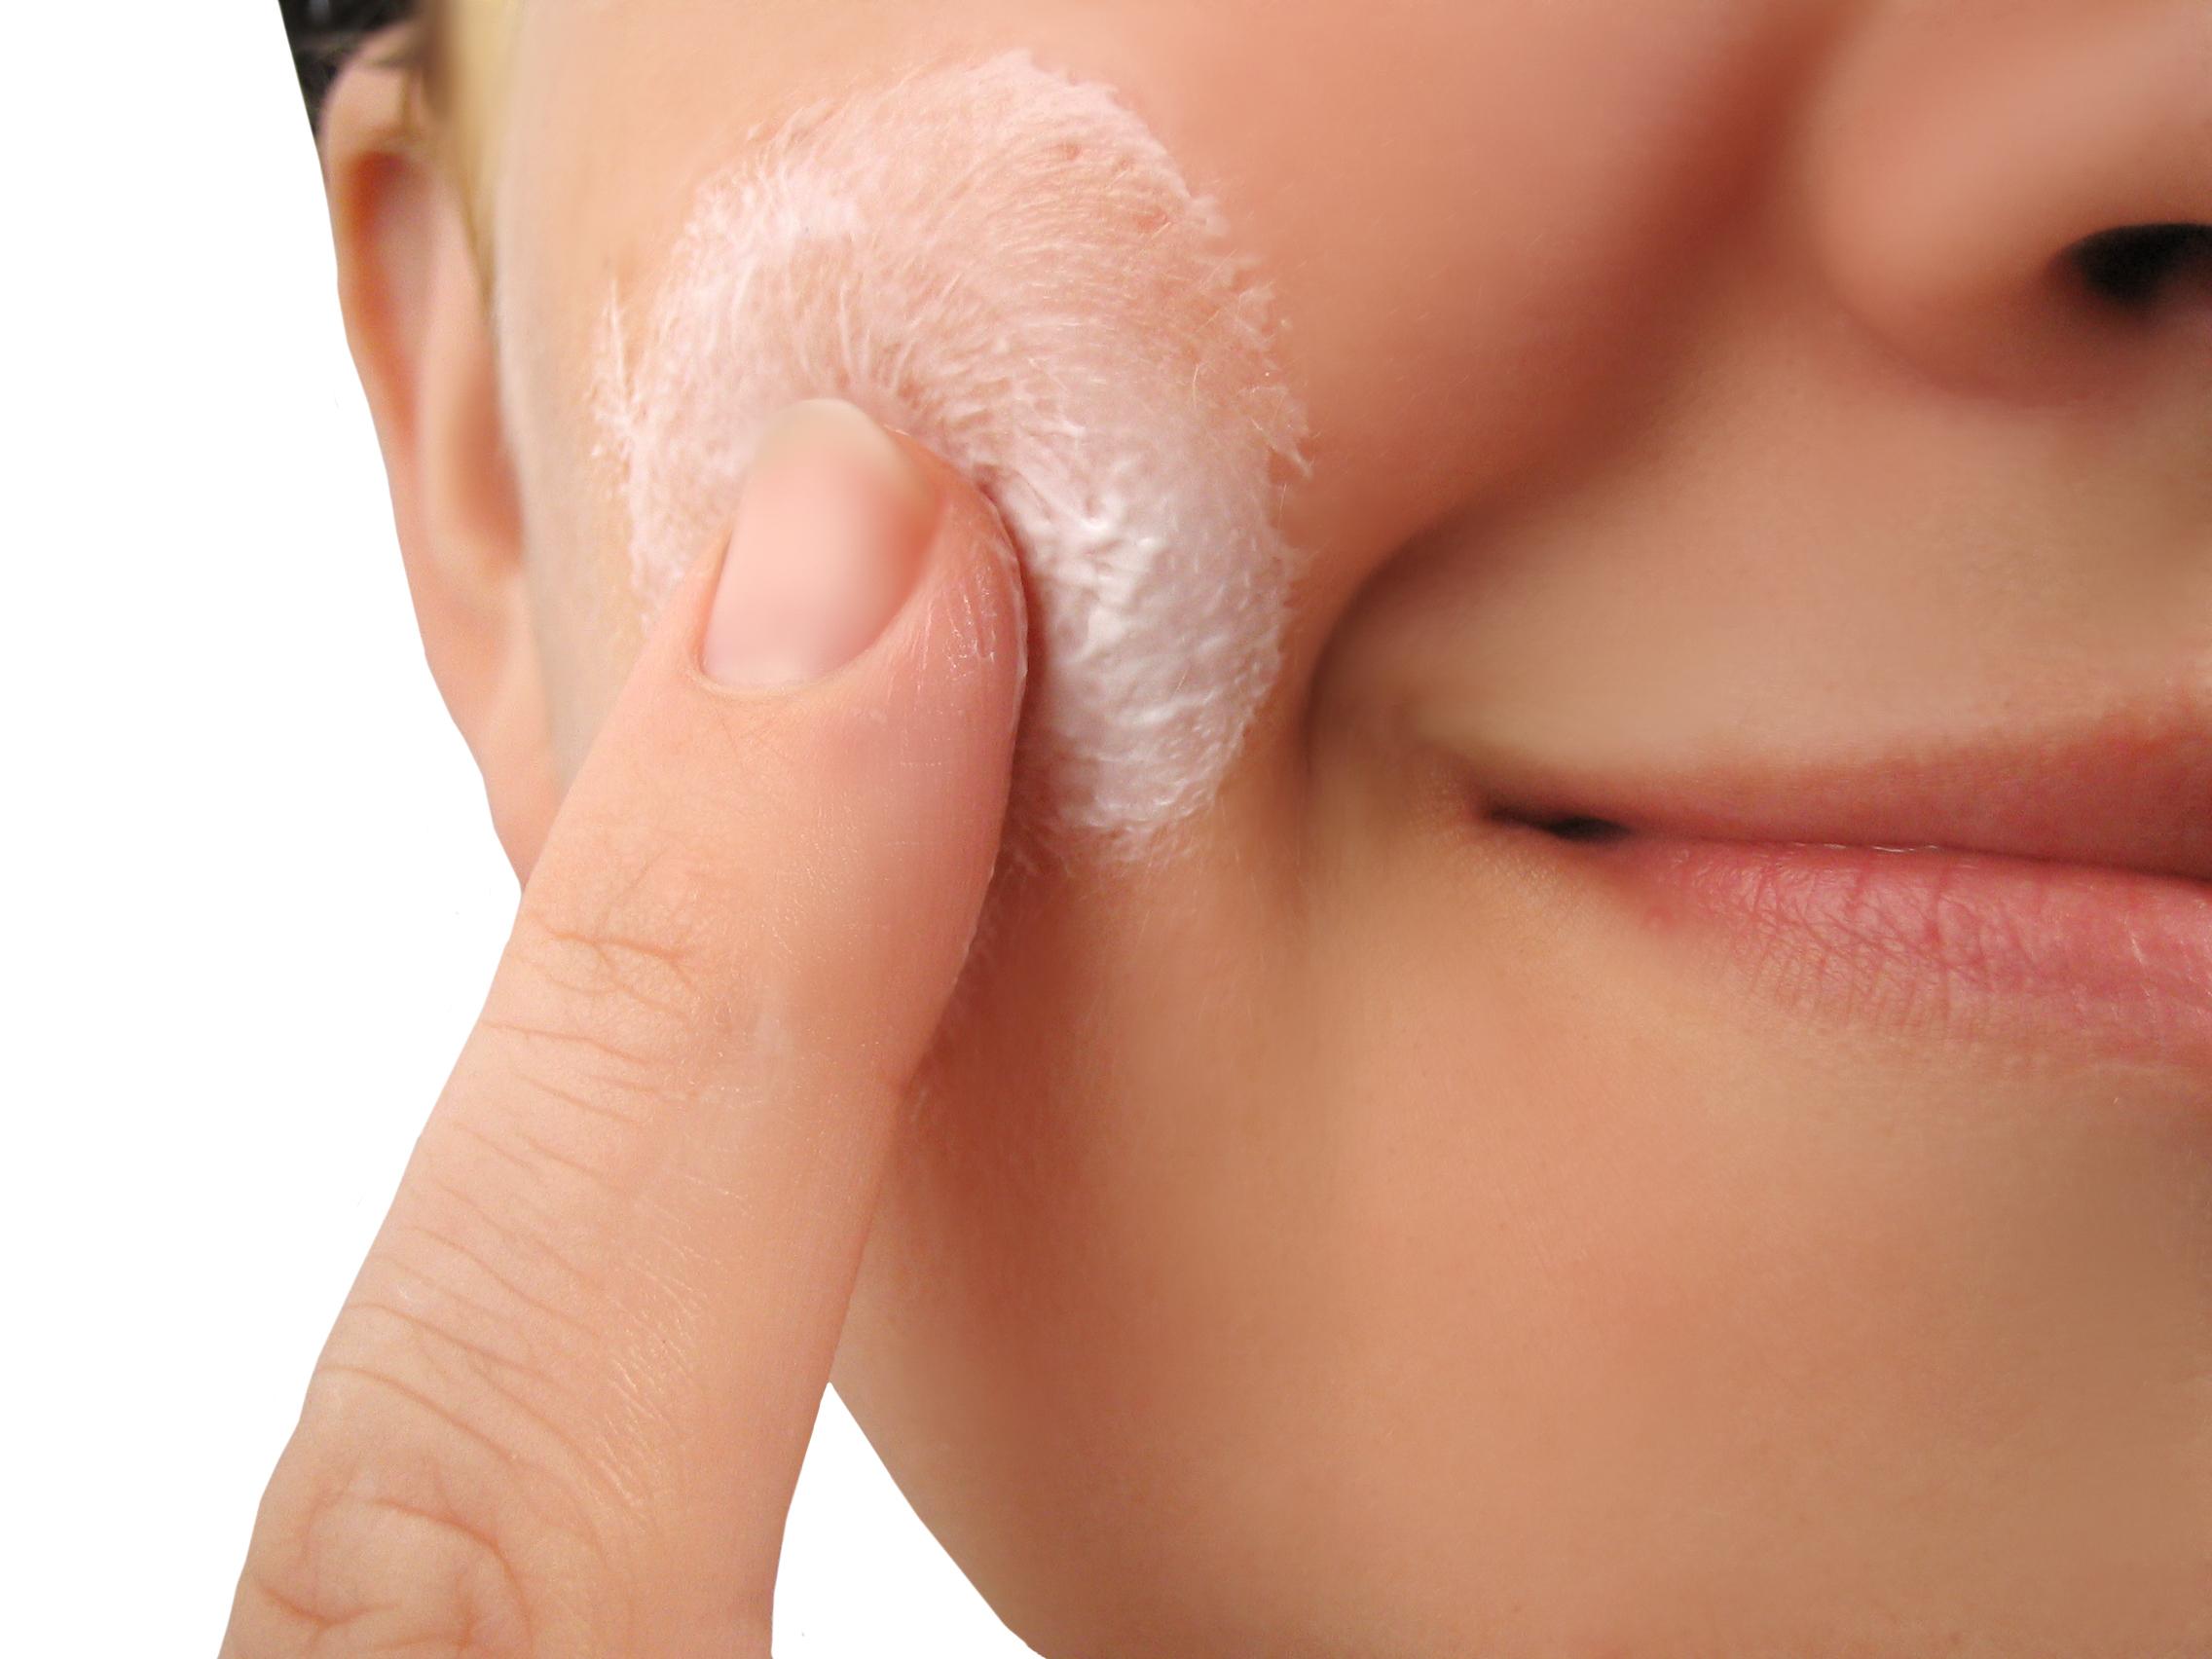 Good turgor: the skin is elastic and elastic